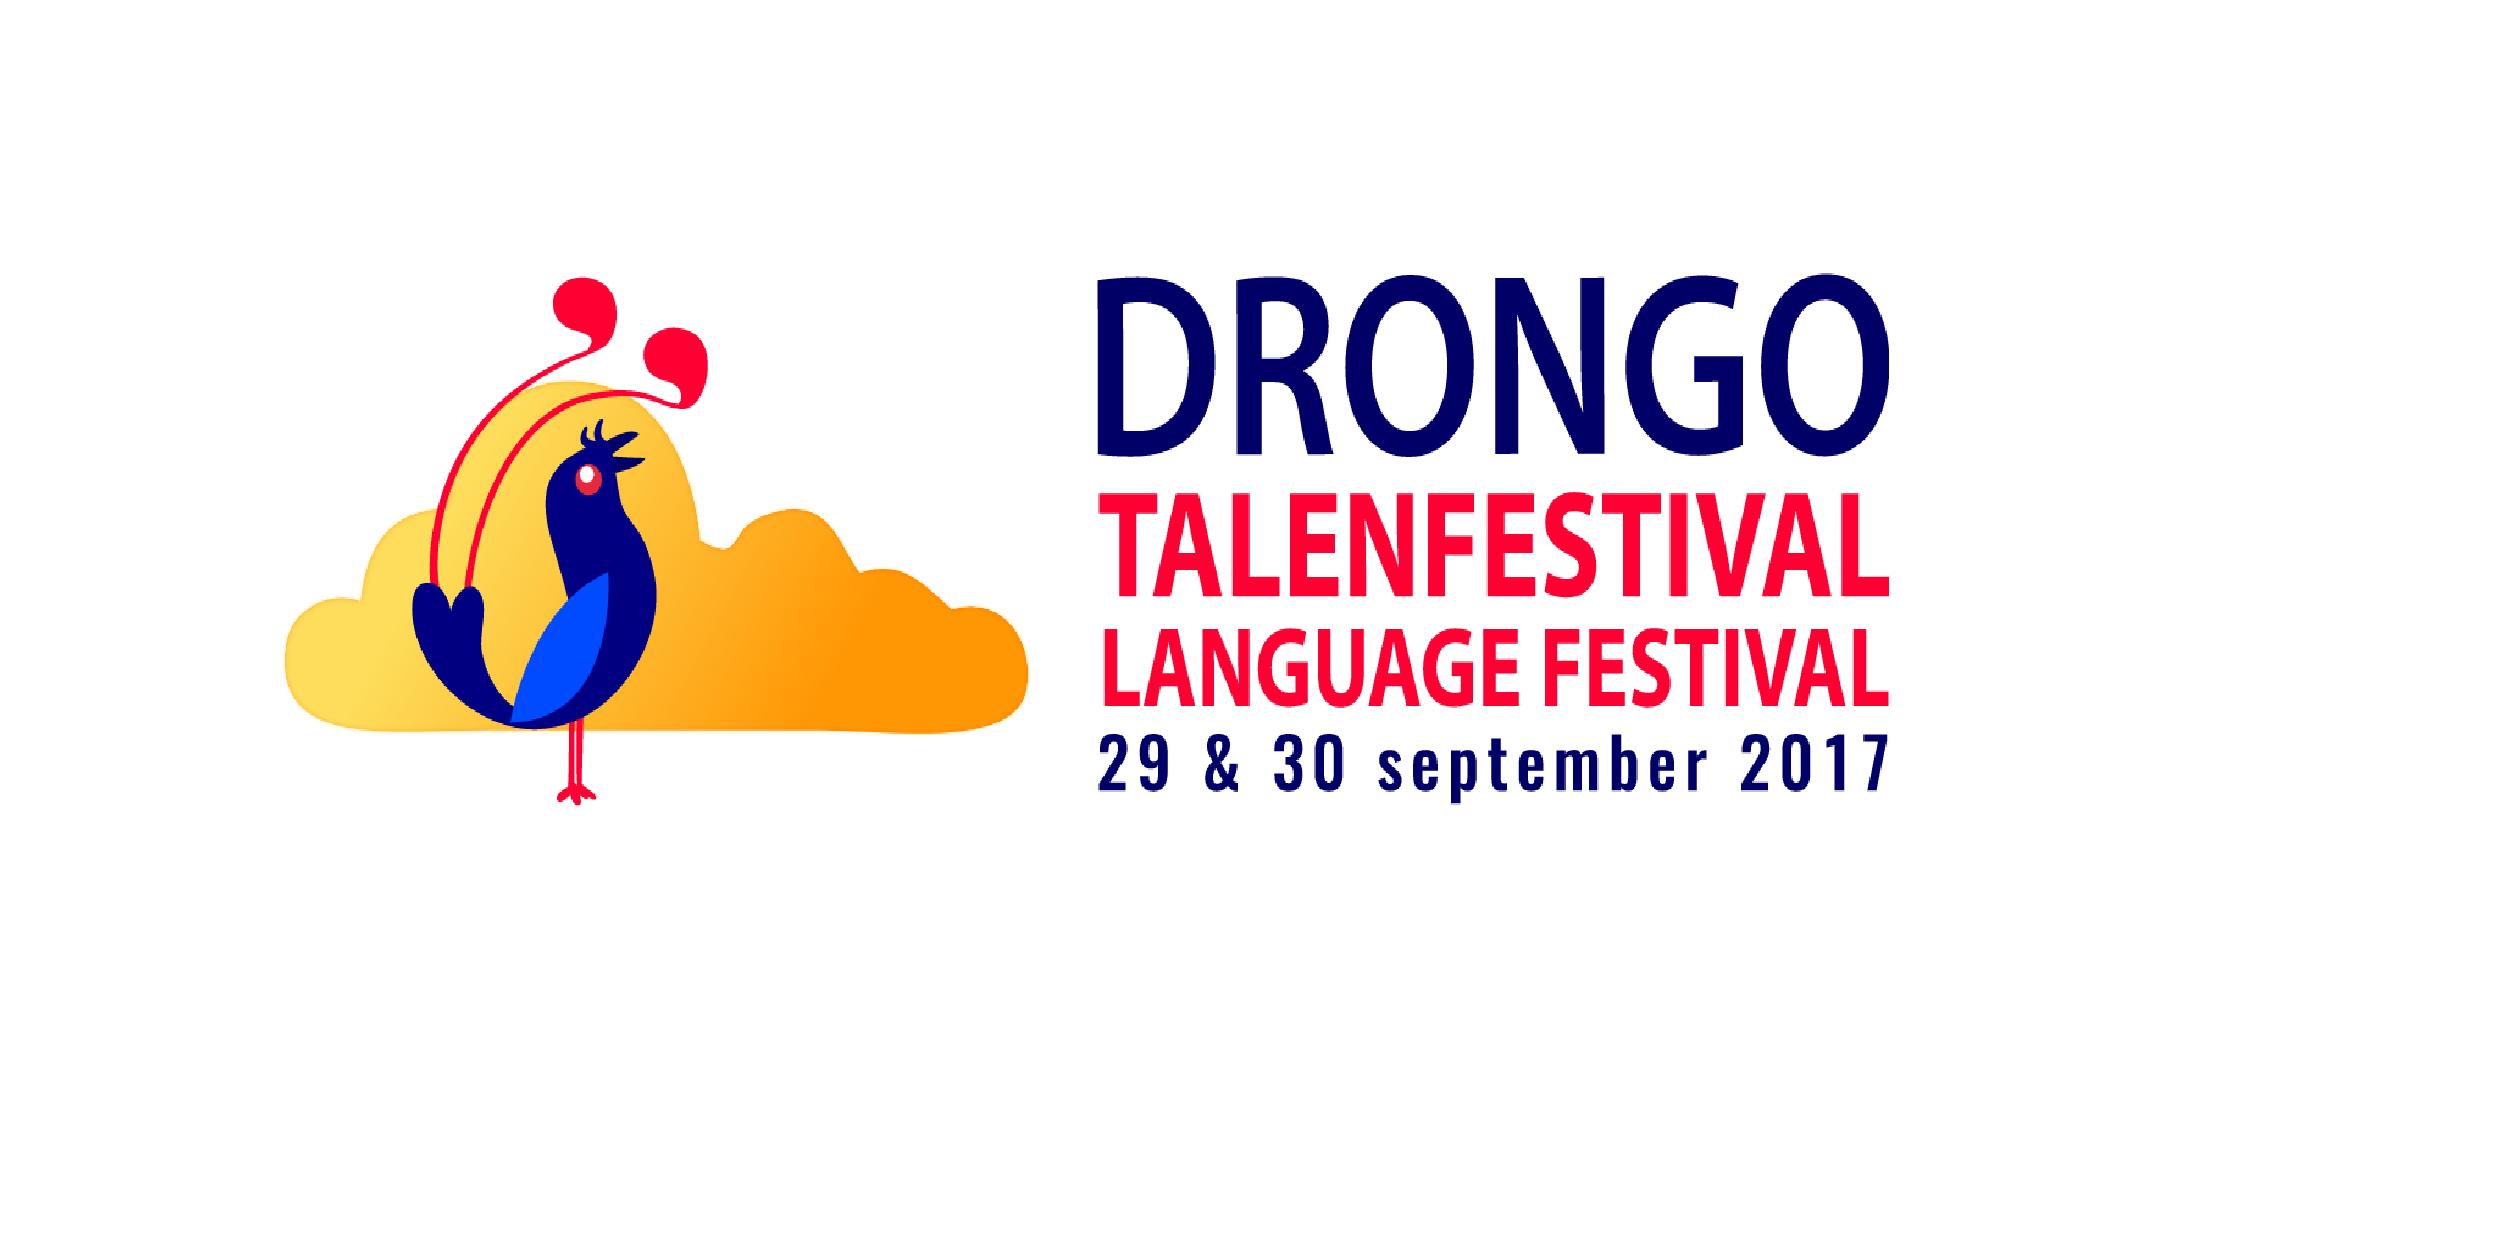 DRONGO language festival